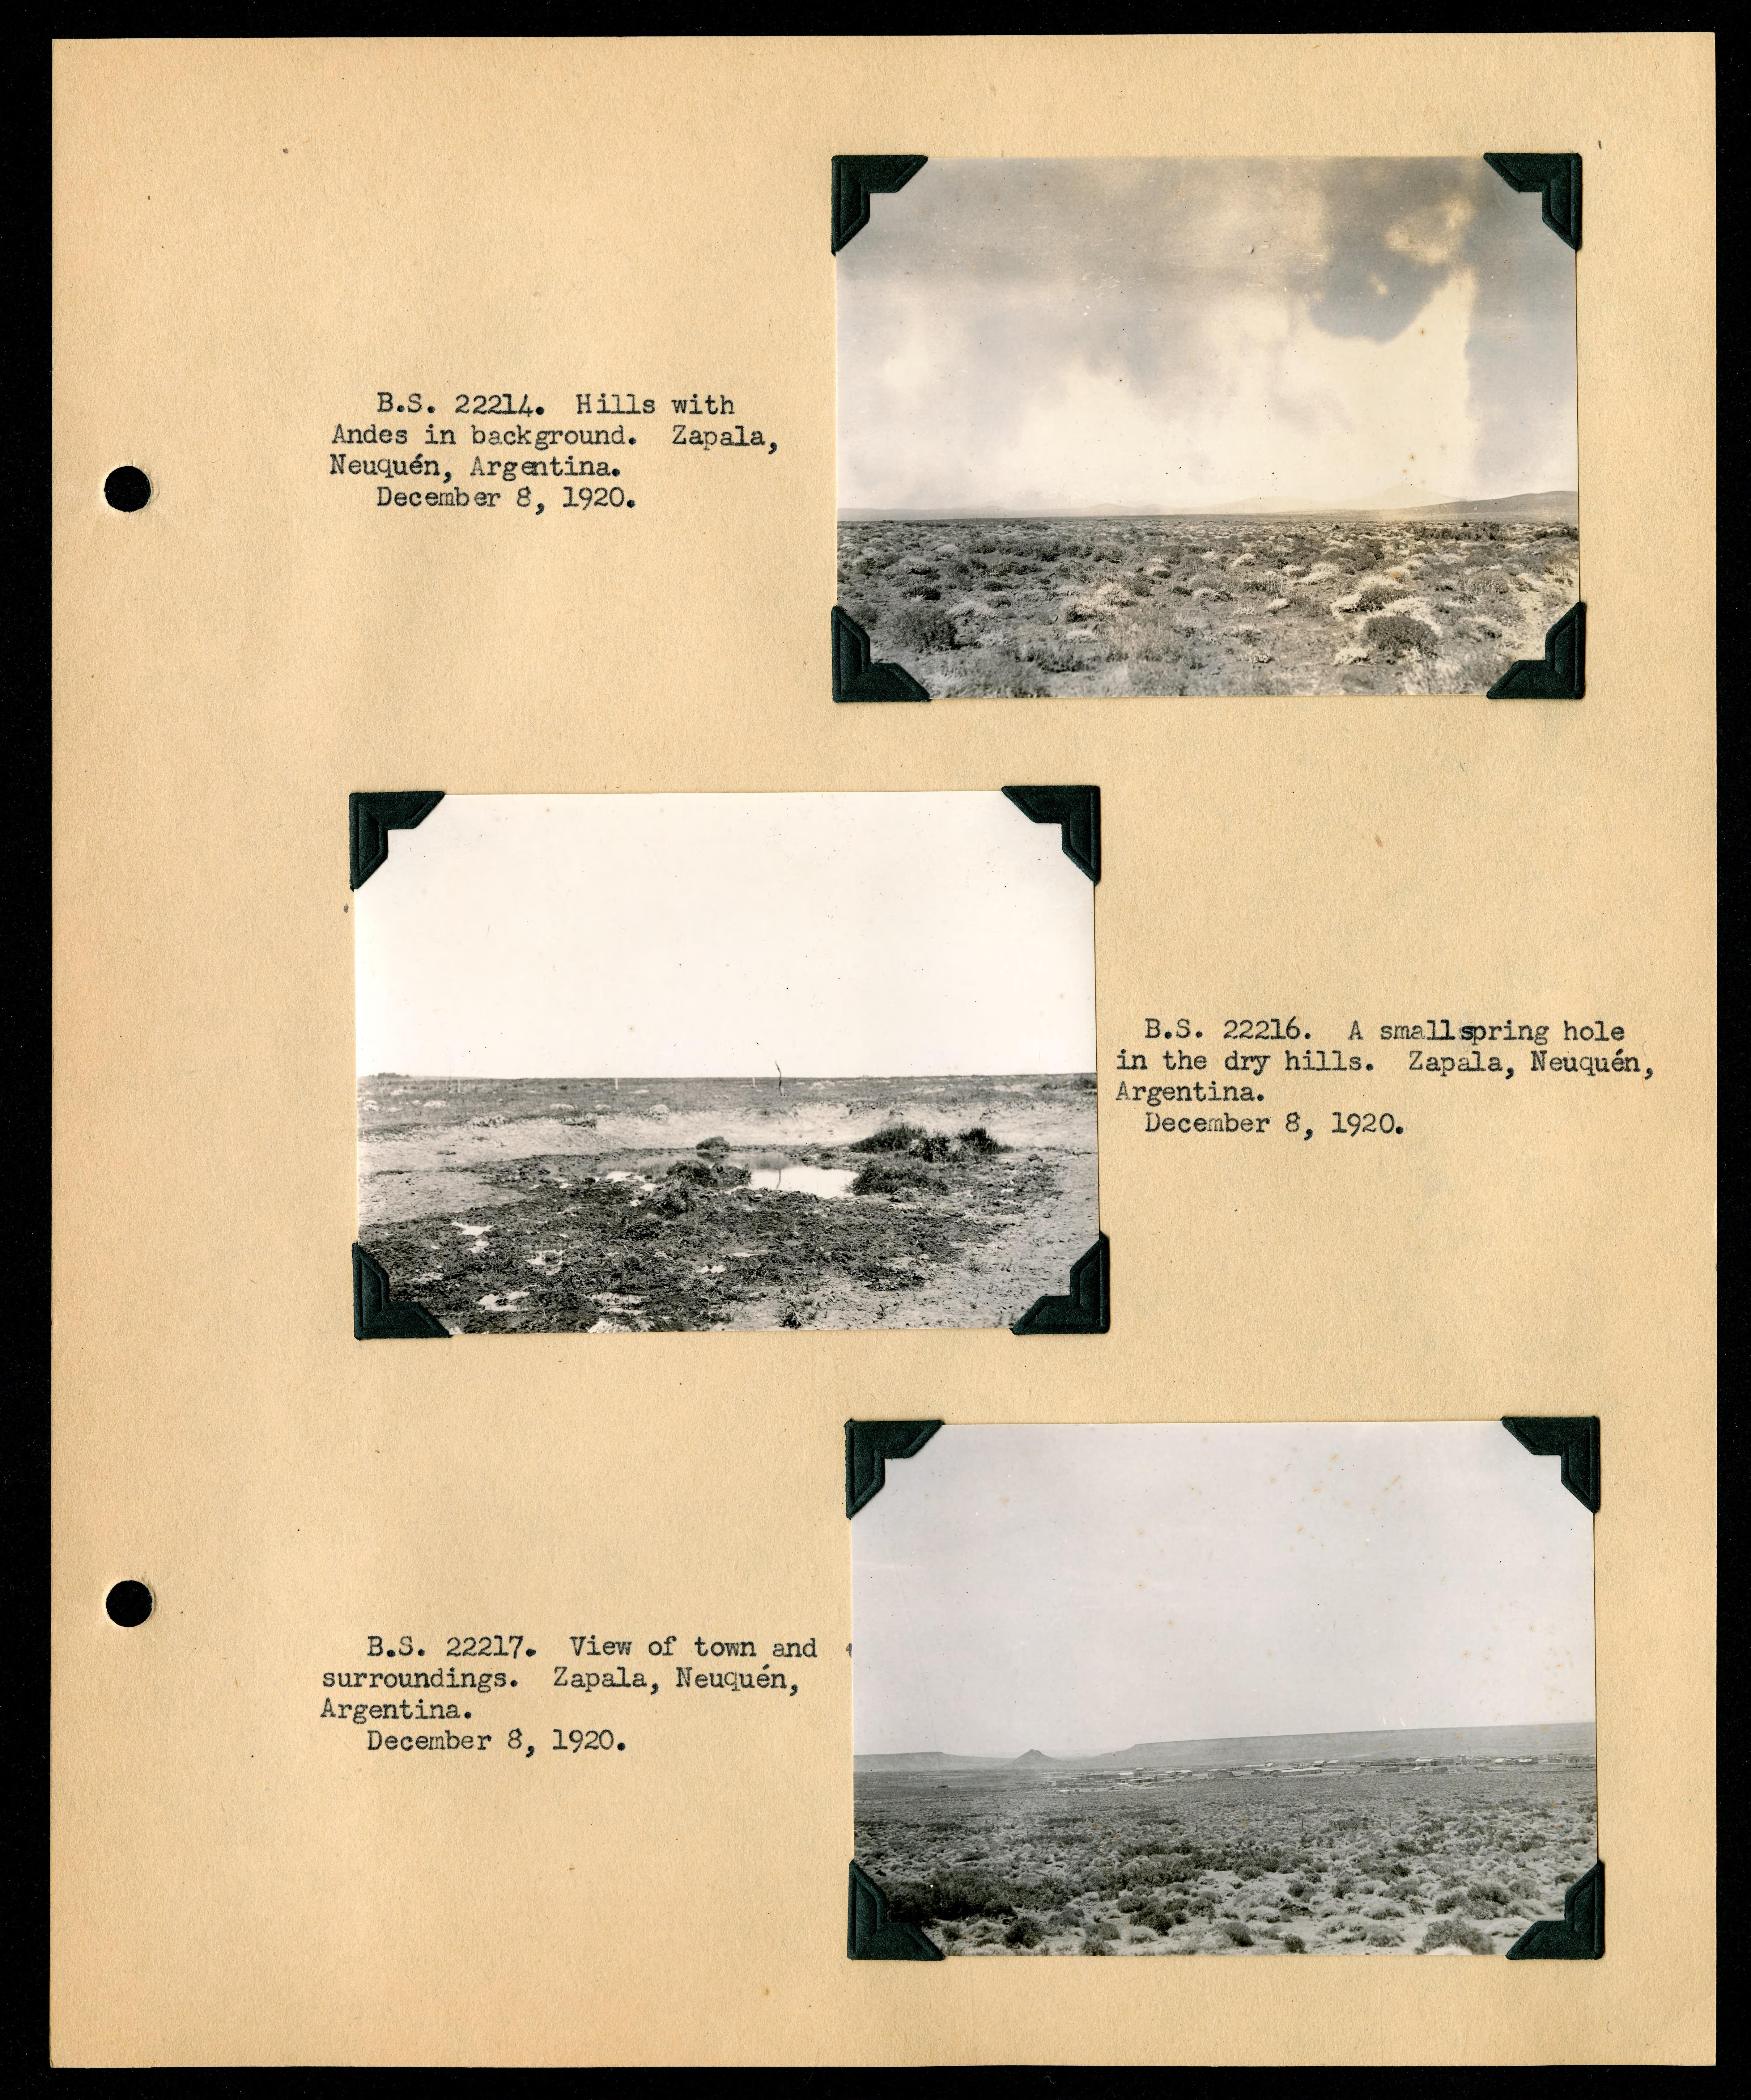 File:Album 1 Uruguay, Argentina, Chile, and Peru, 1920-1921